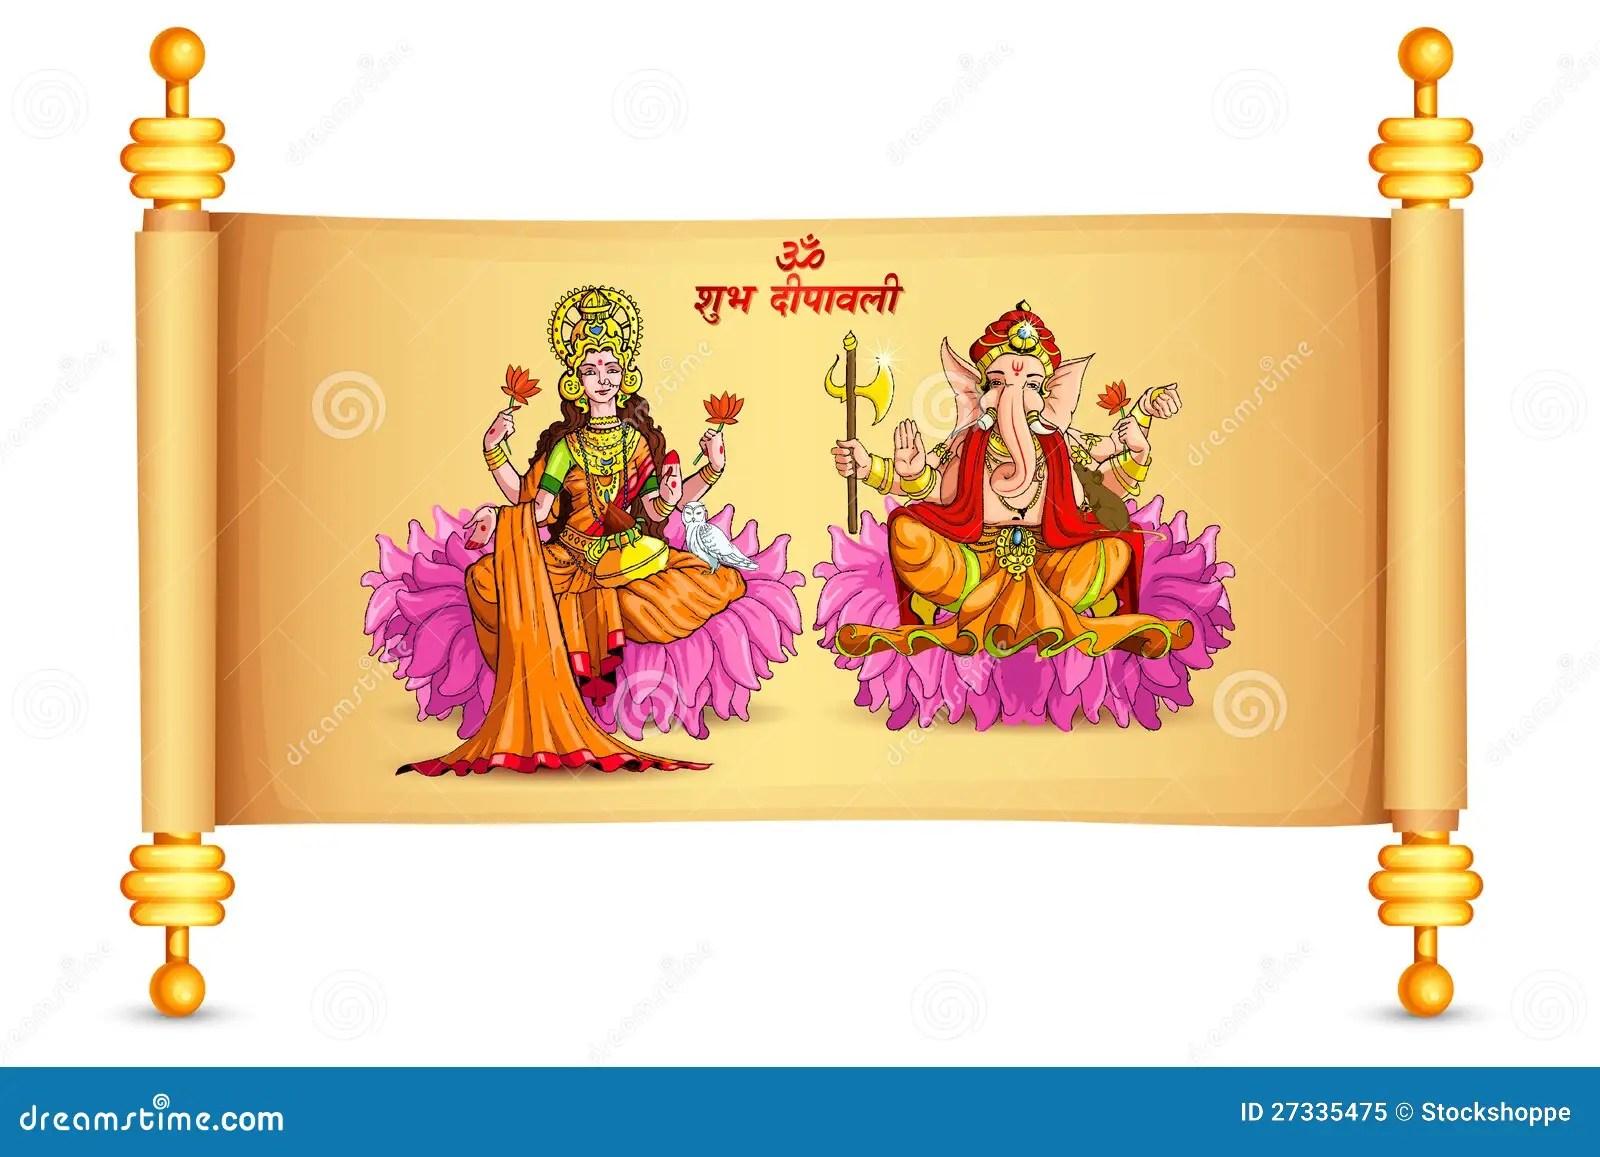 Ganpati 3d Wallpaper Lakshmi And Ganesh Royalty Free Stock Photo Image 27335475